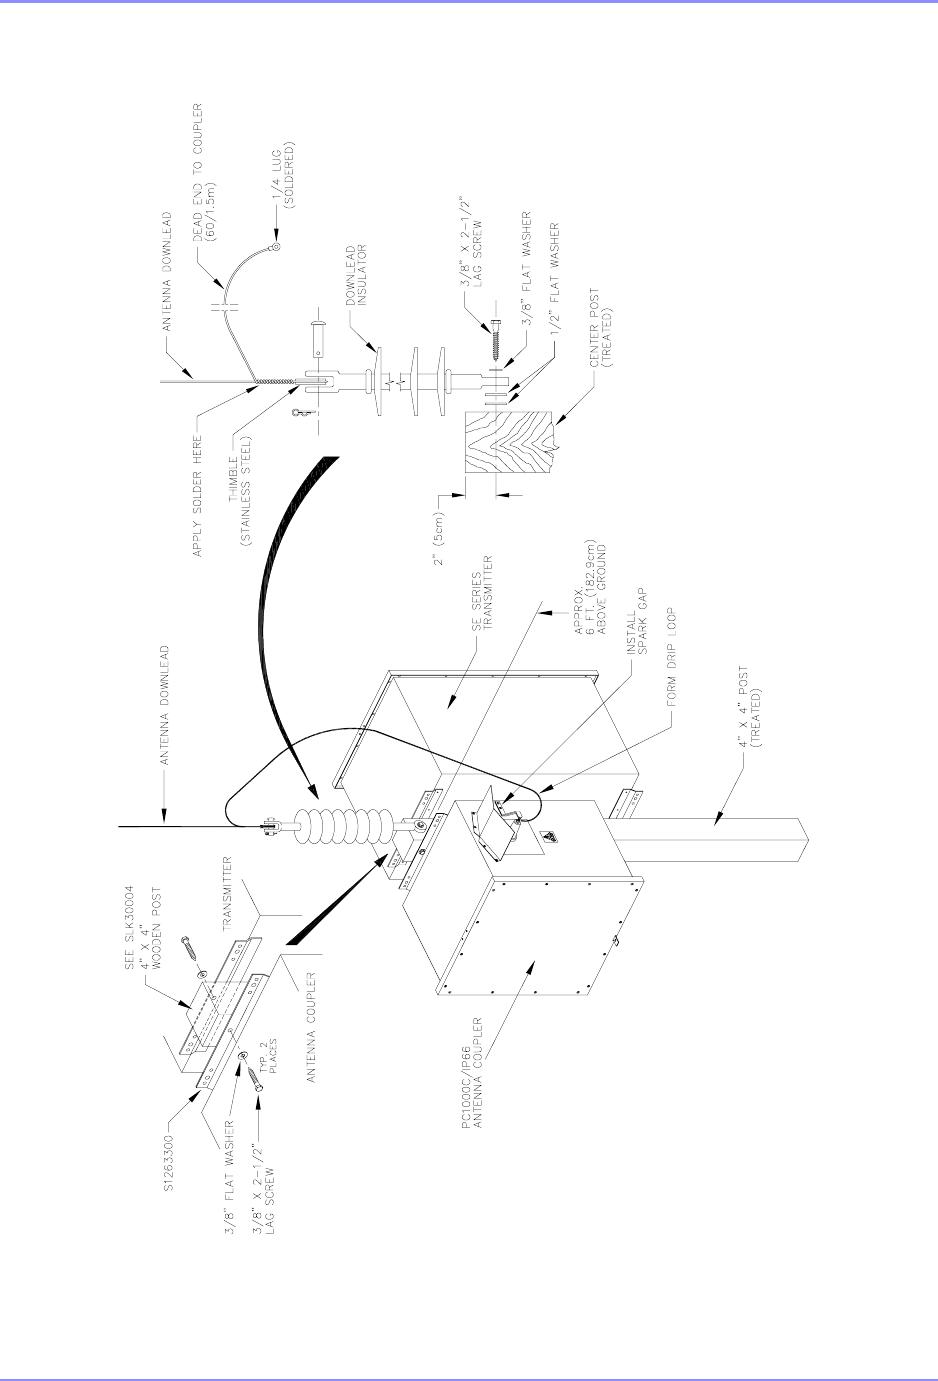 Southern Avionics SE125 Non-directional radio beacon User